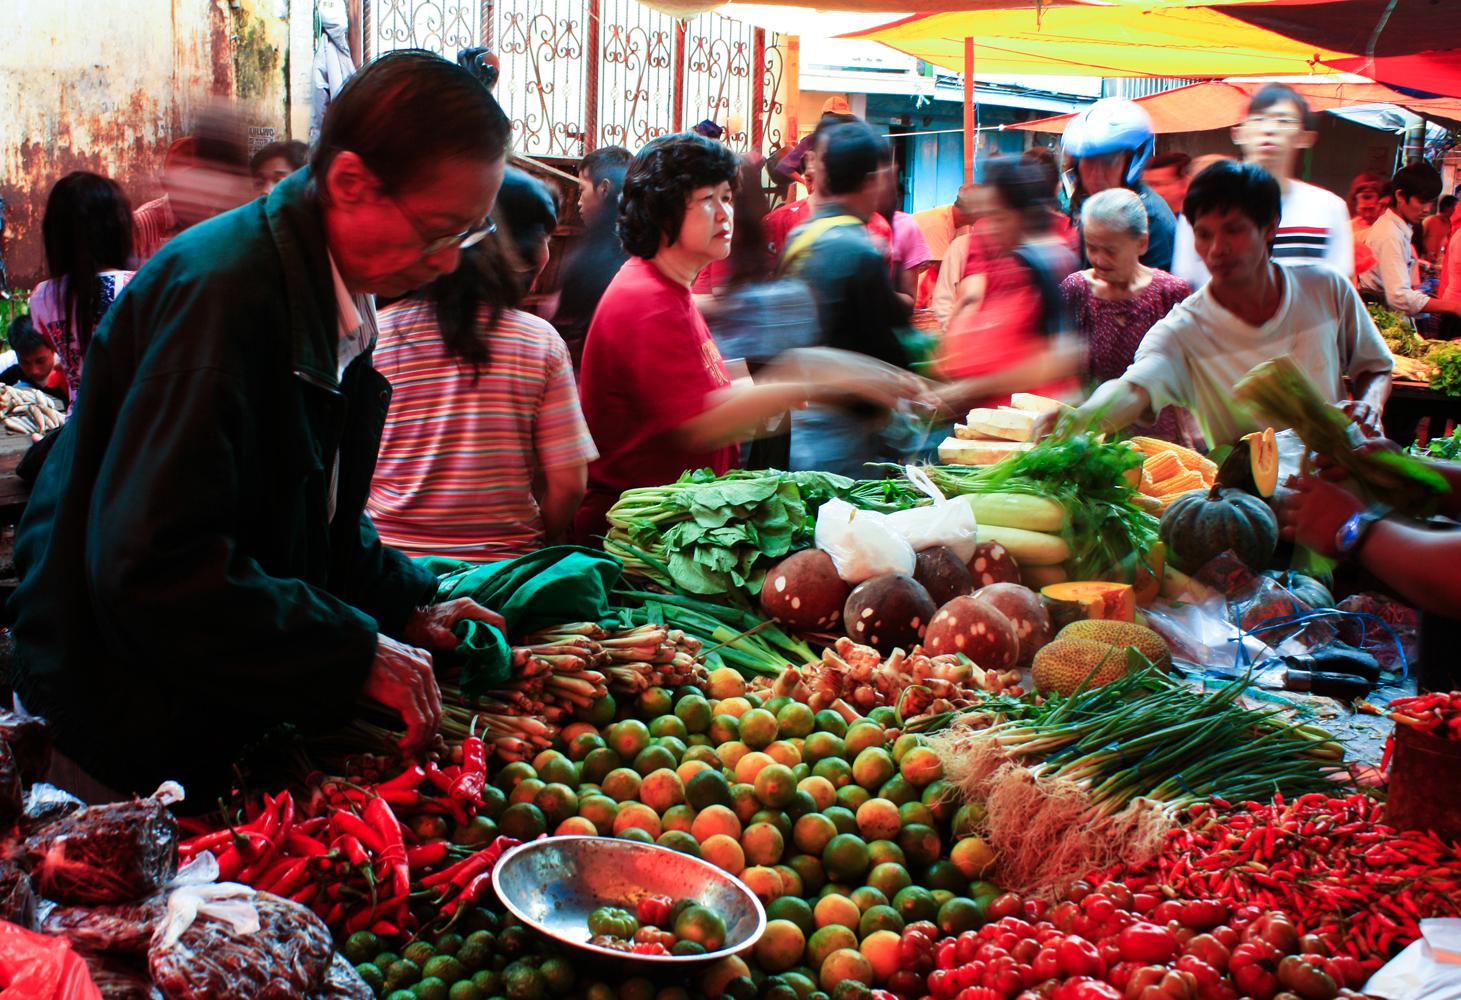 Suasana jual beli di pasar pecinan makassar, minggu, 22 januari 2012